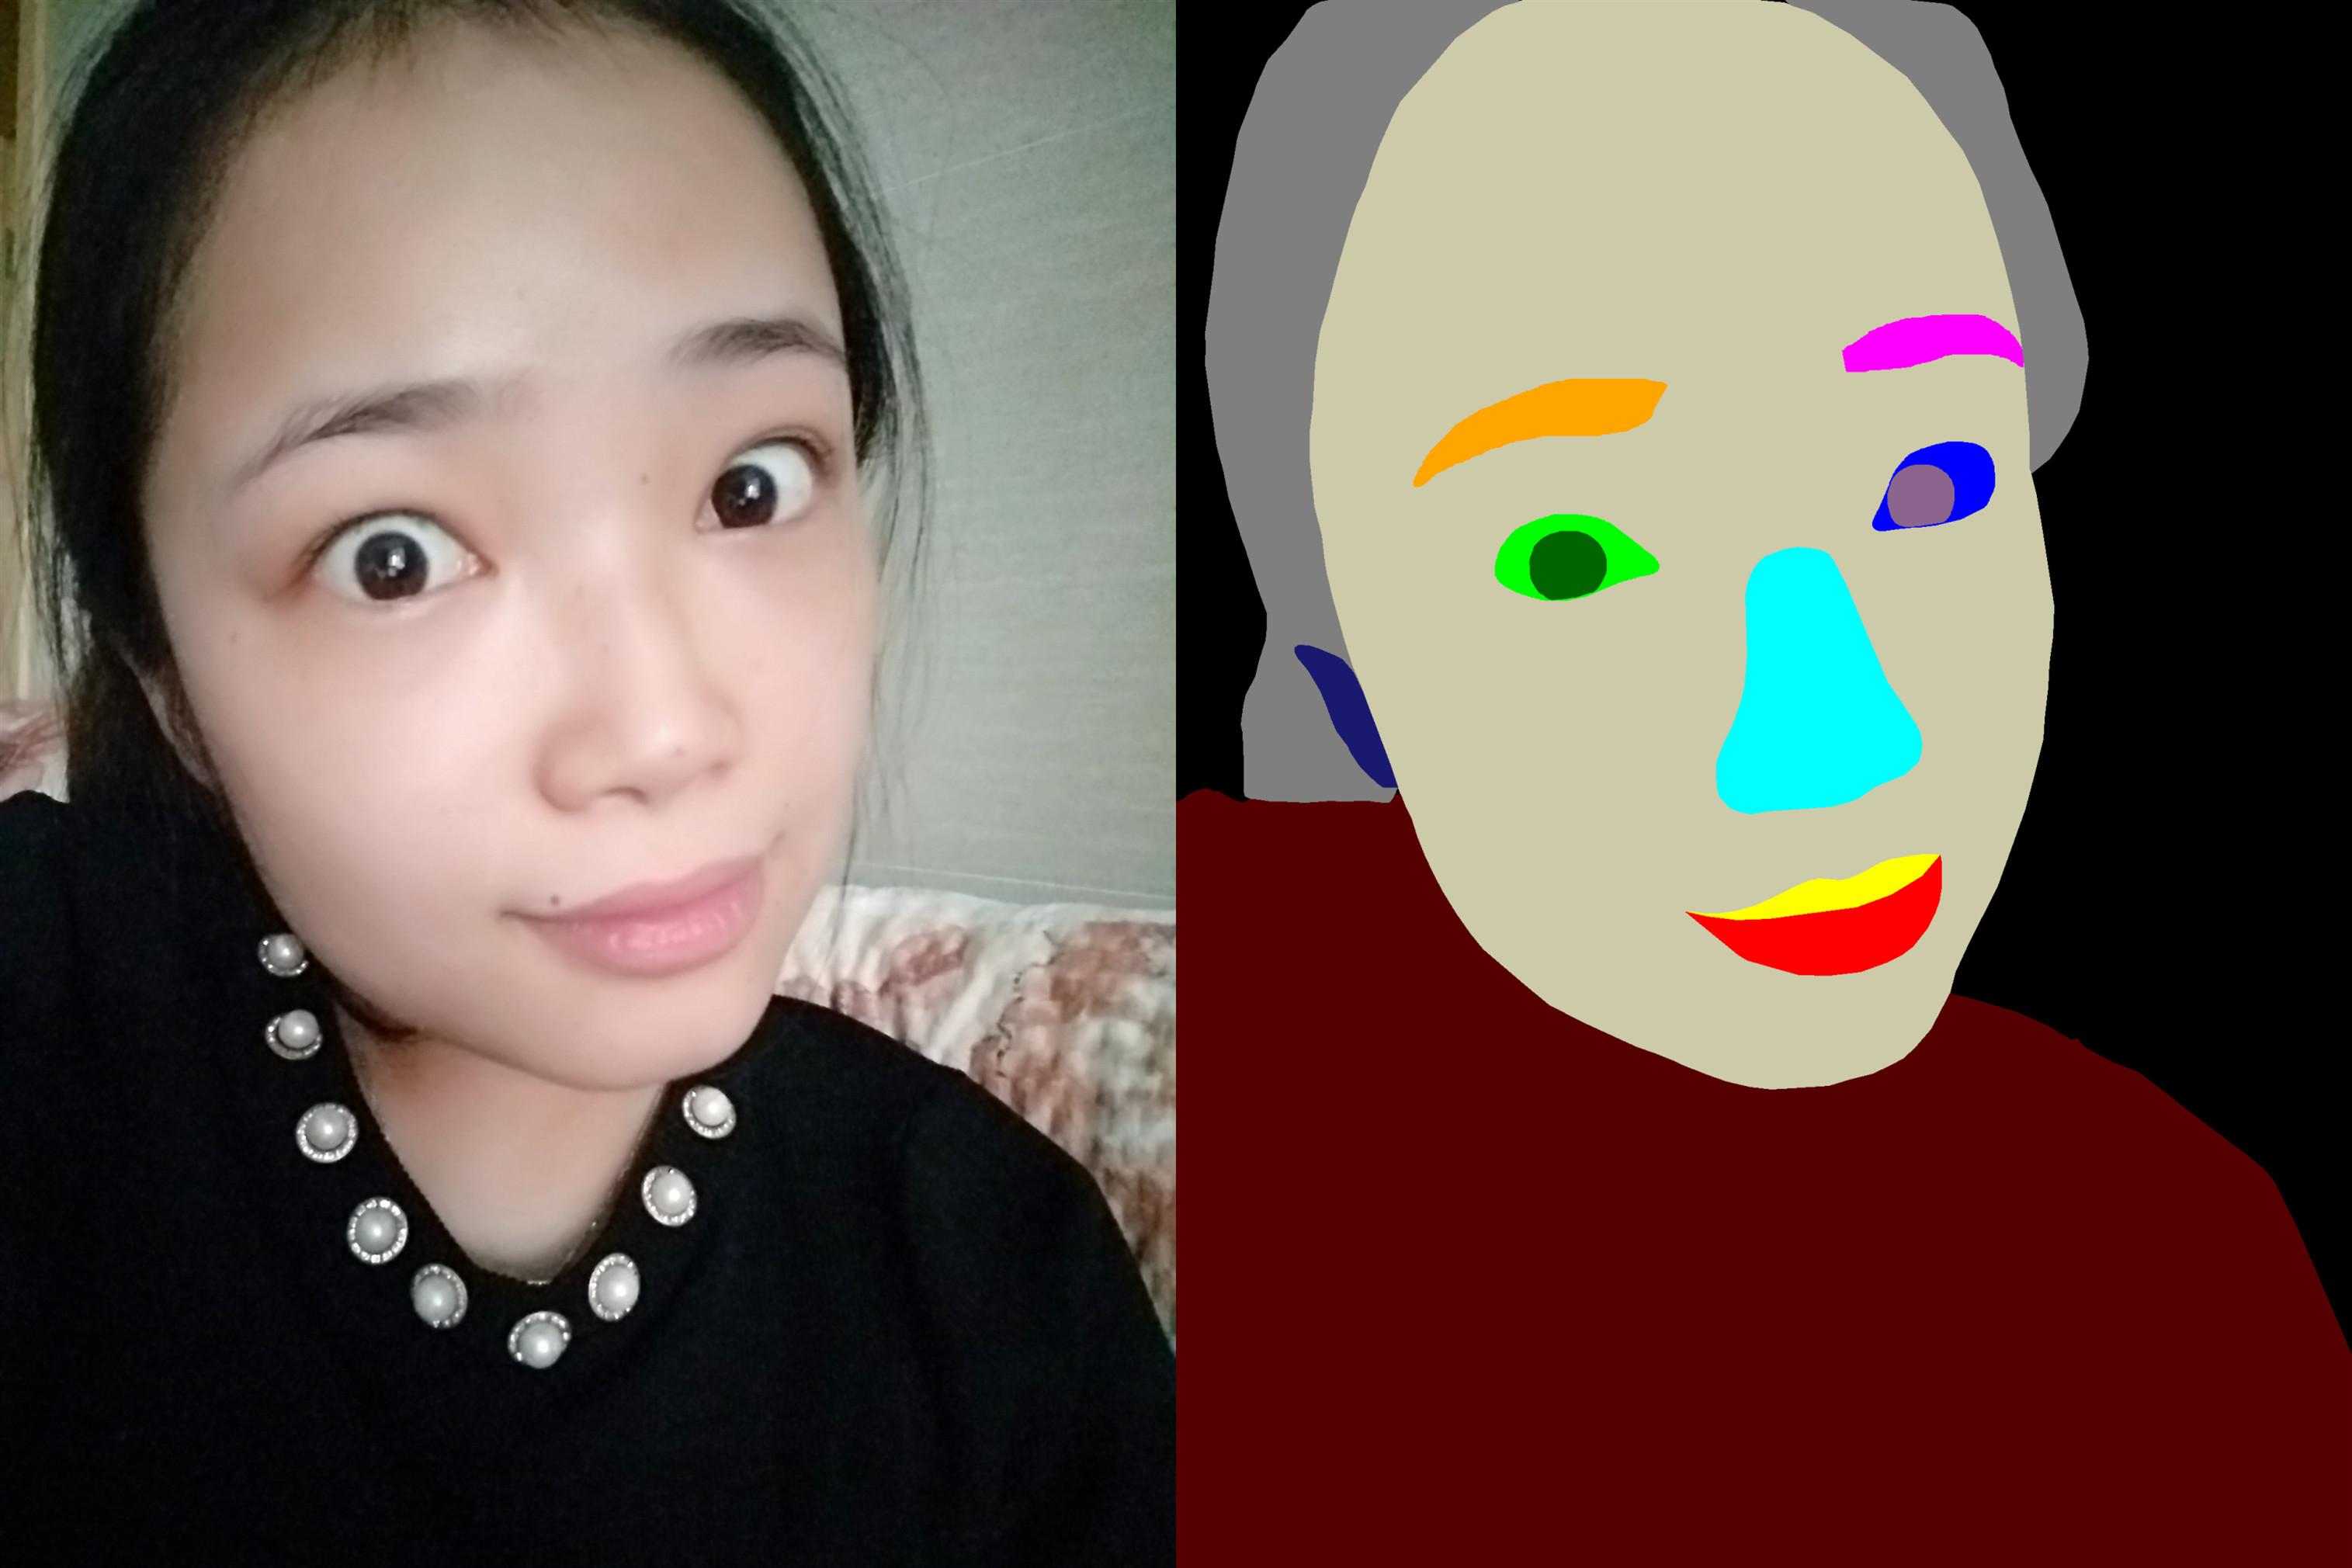 70,846 Images – Human Face Segmentation Data_Data Products_Datatang